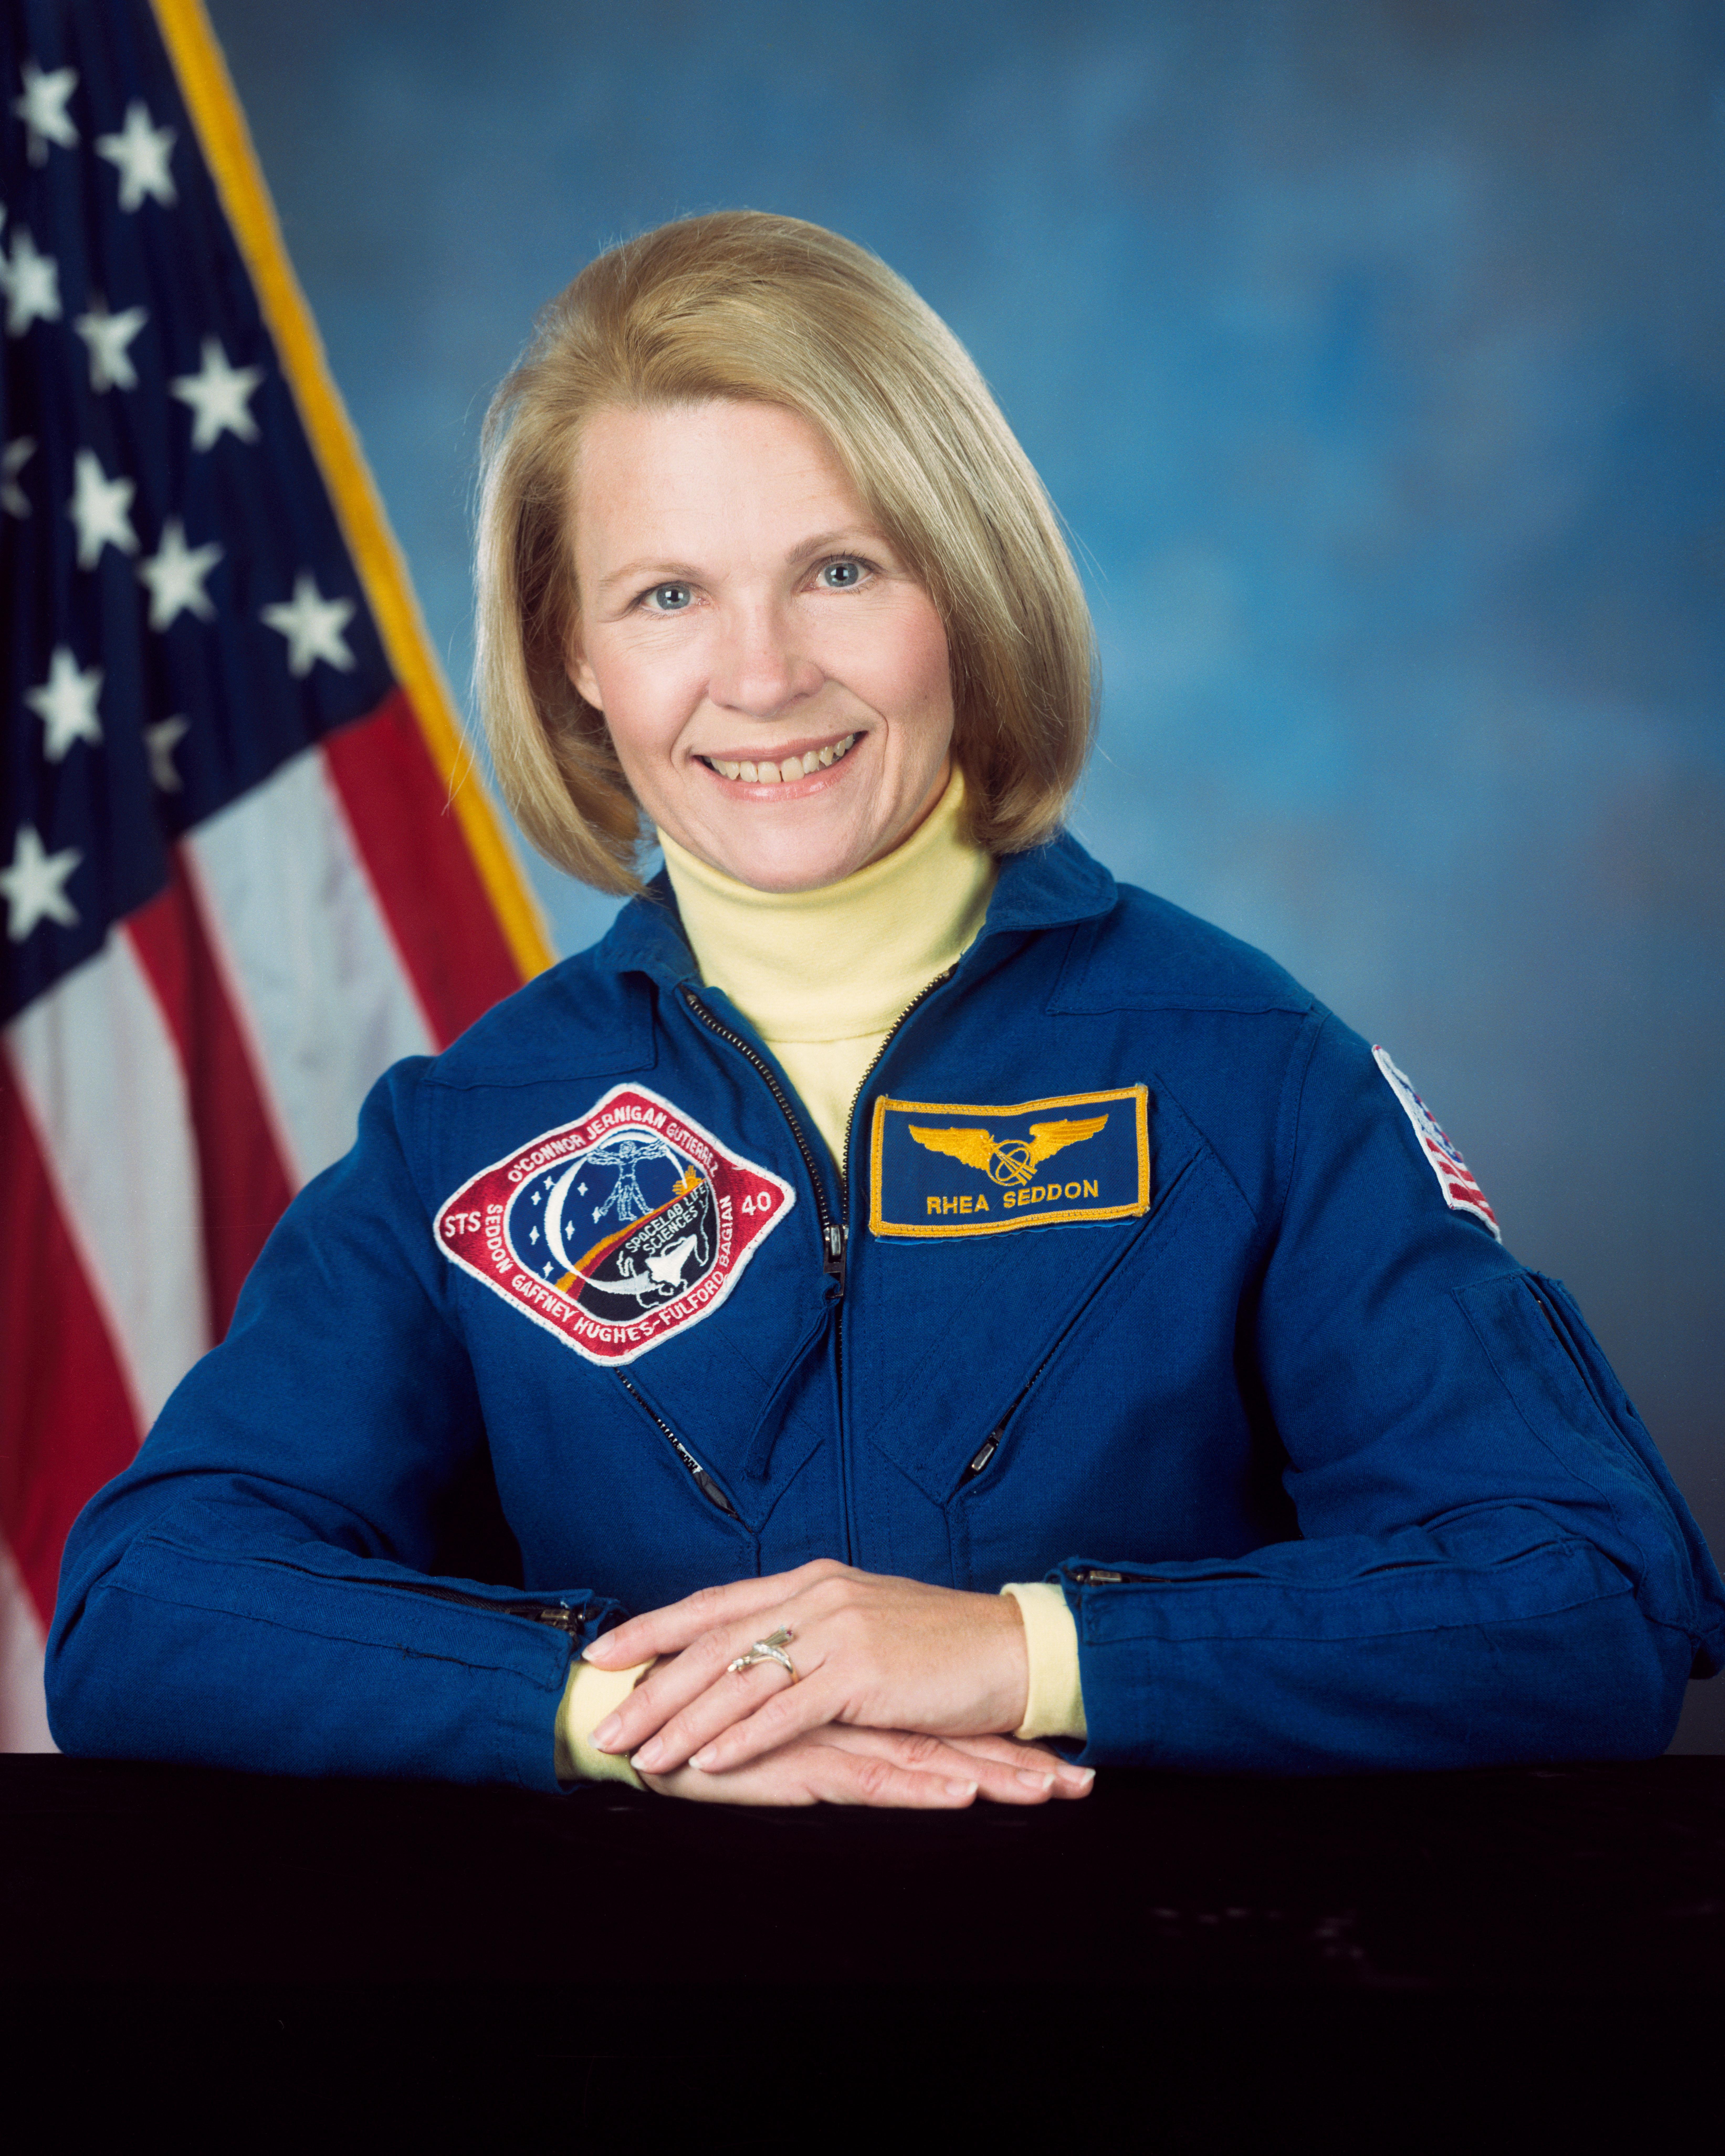 Astronaut M. Rhea Seddon MD, NASA photo (22 May 1992)Source: Wikipedia (www.jsc.nasa.gov unavailable November 2019) MRSeddon.jpg